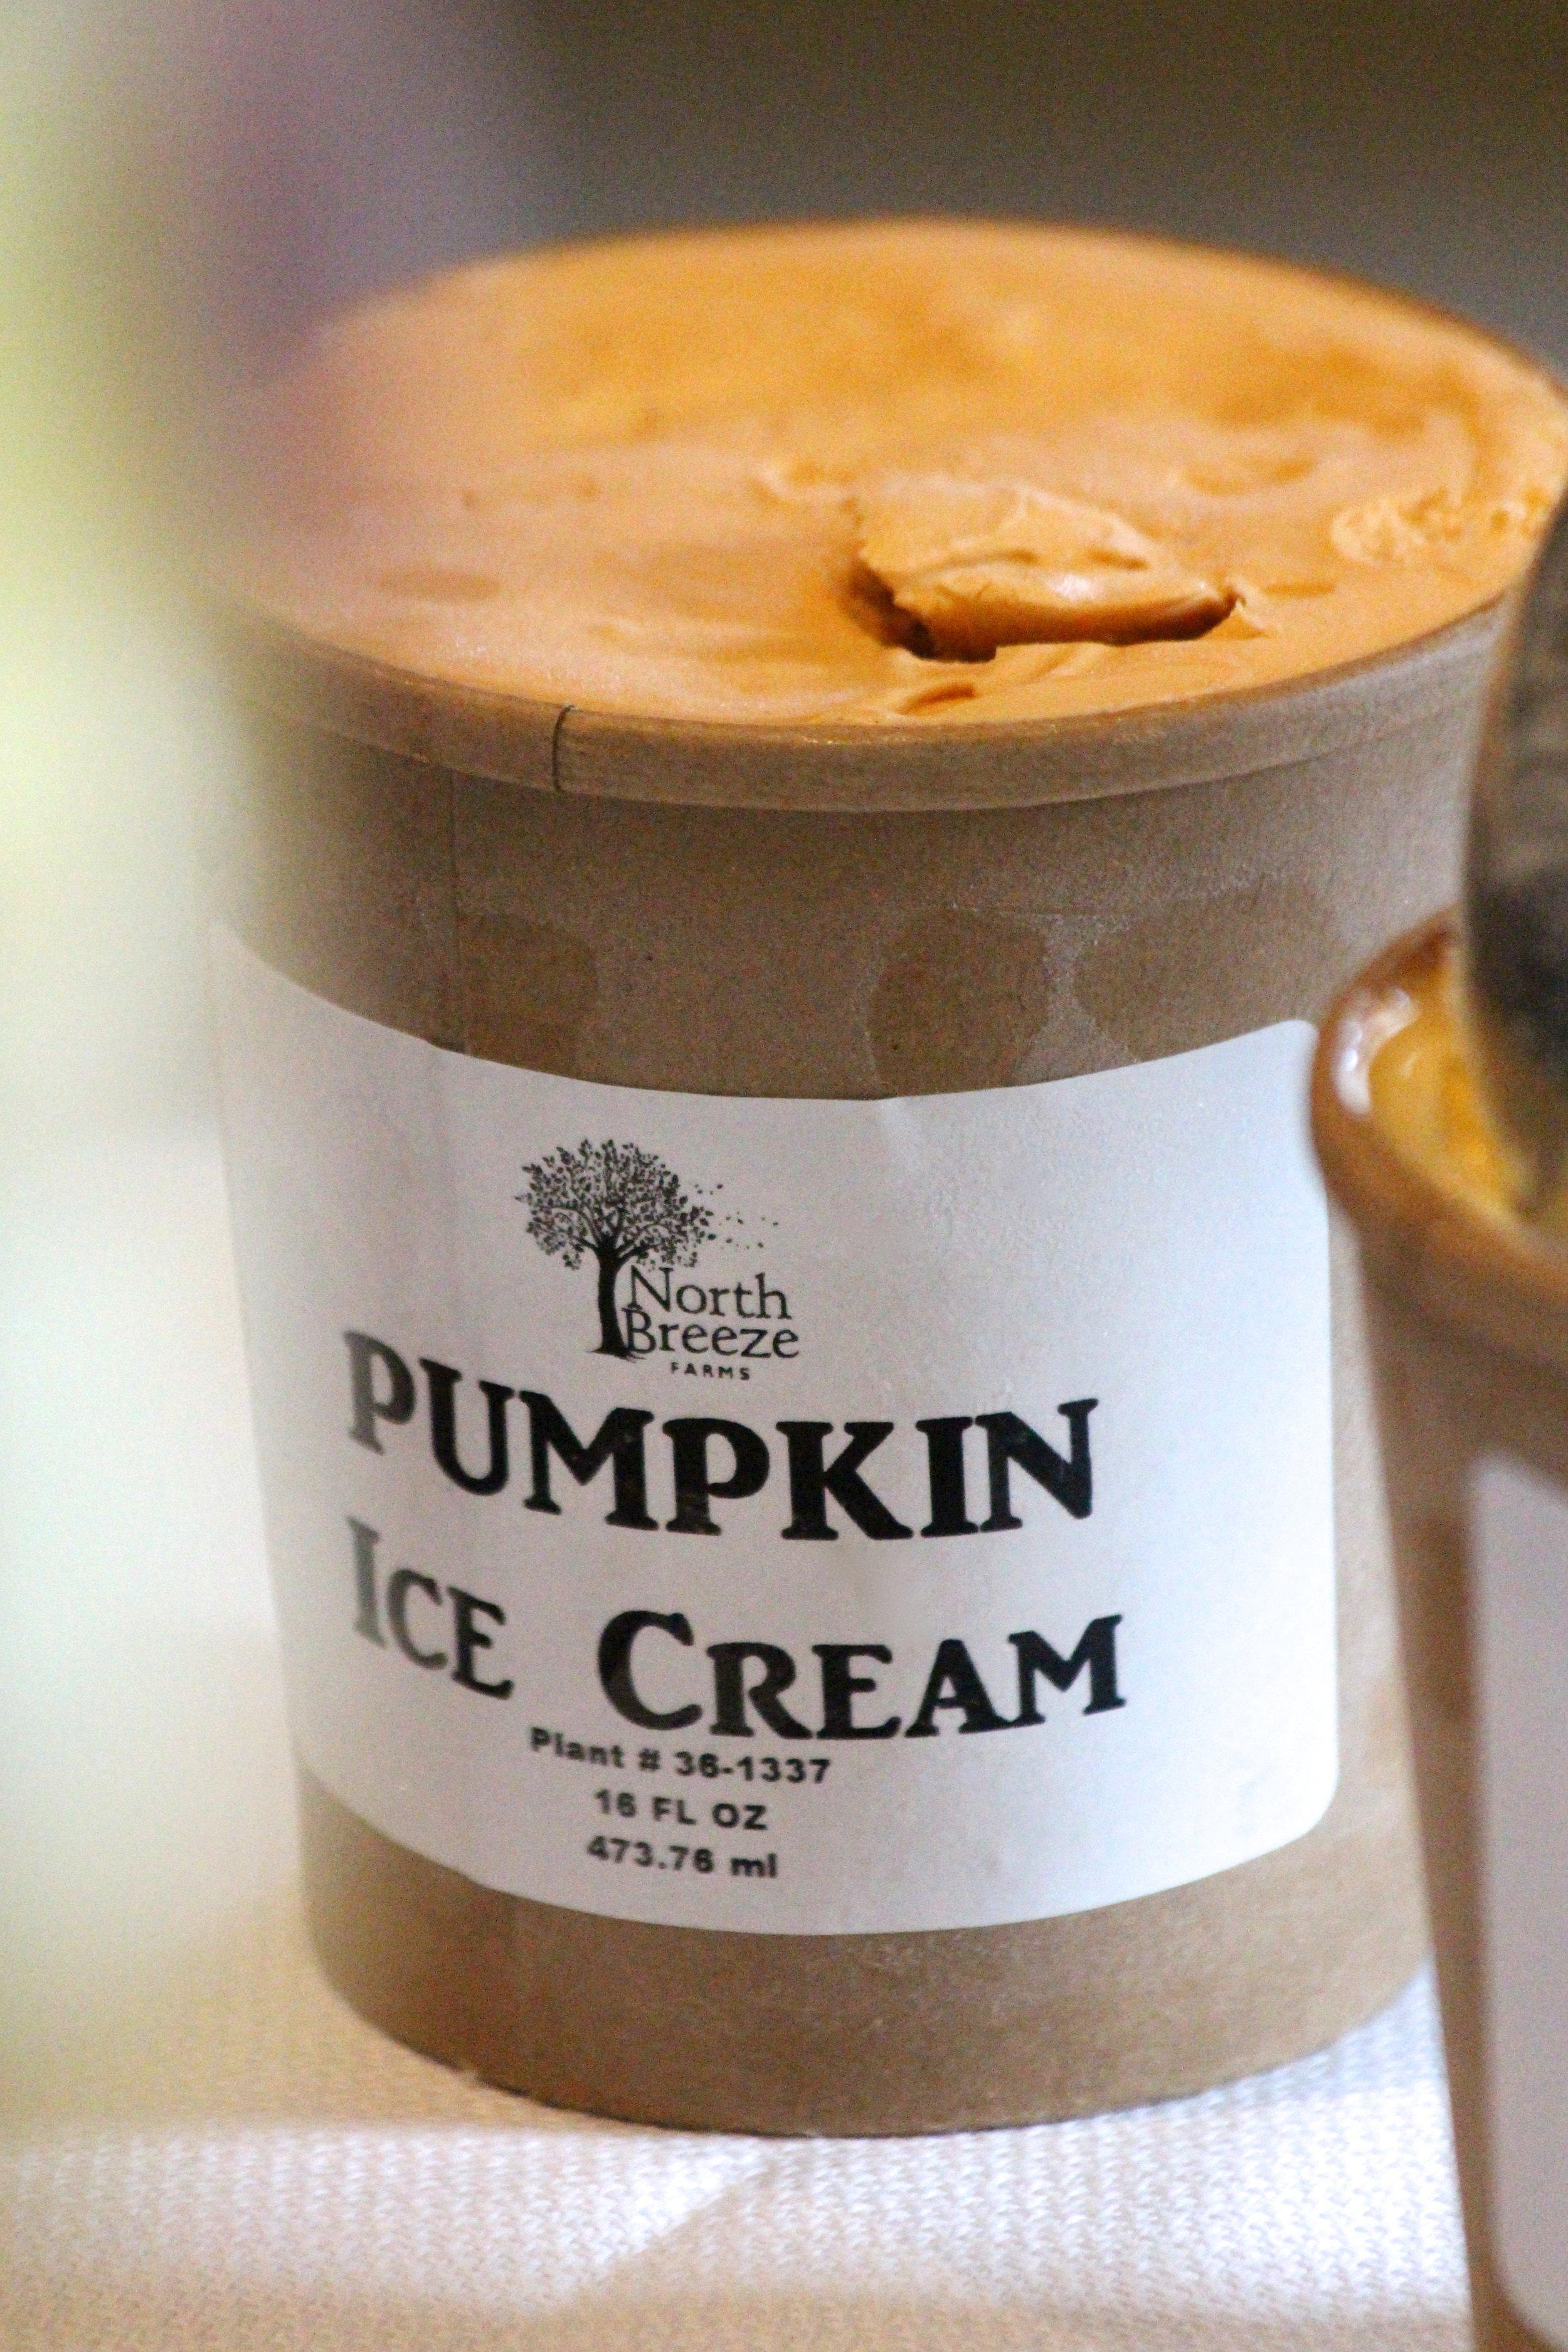 Pumpkin Ice Cream $5.99